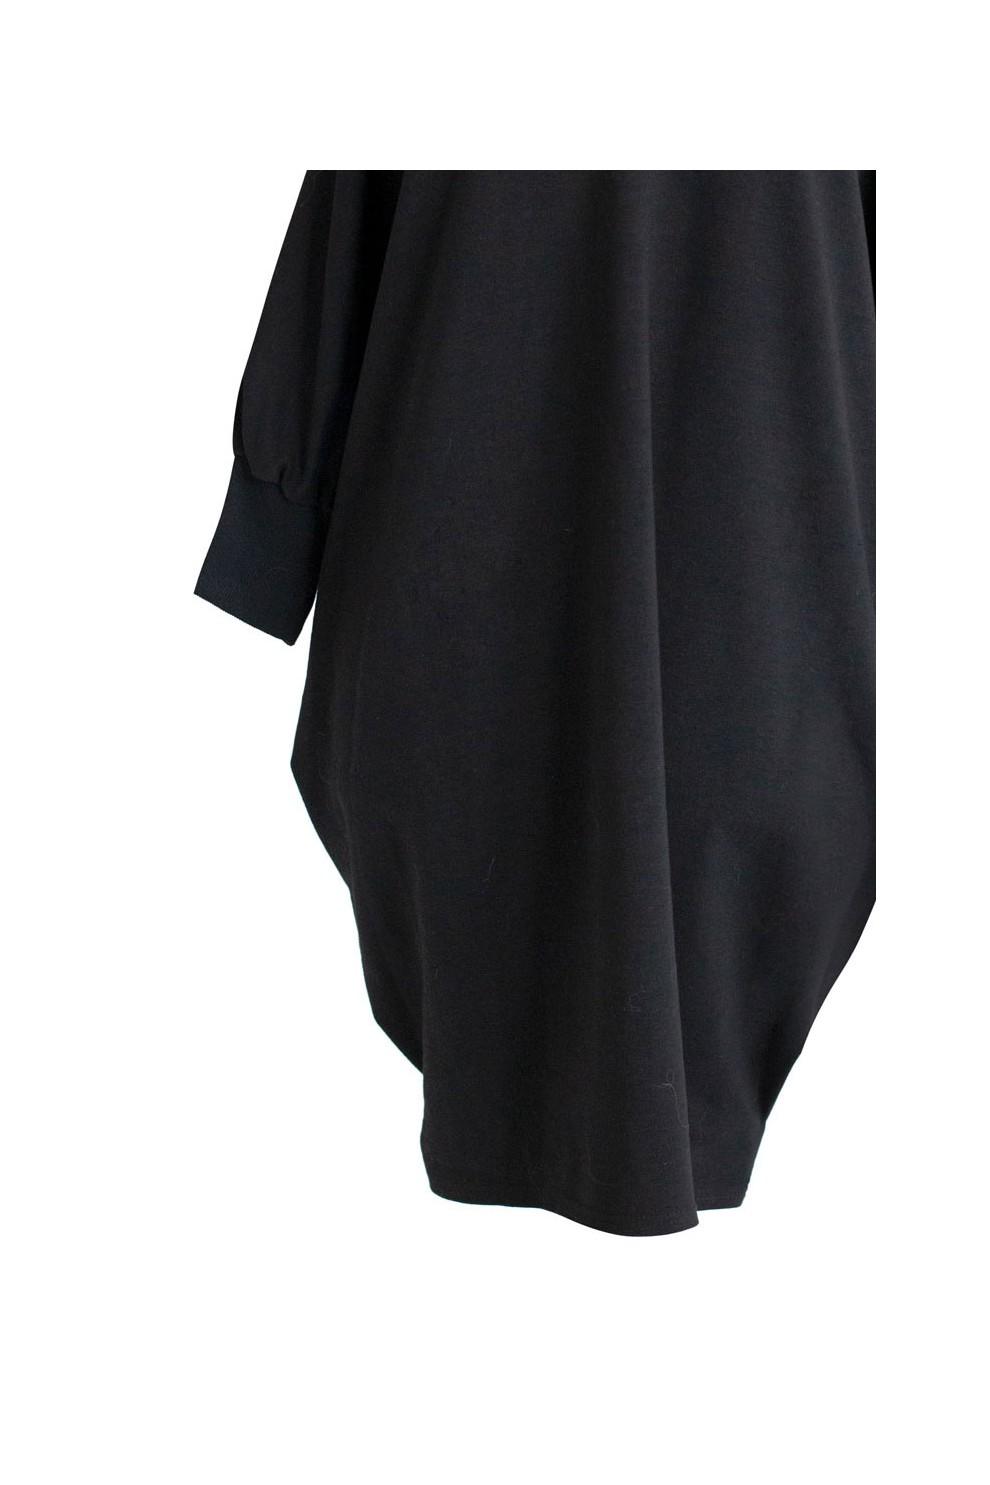 5ac0cfb0db5ccc Czarna tunika hiszpanka - SANDRA - Sklep PLUS SIZE XL-ka